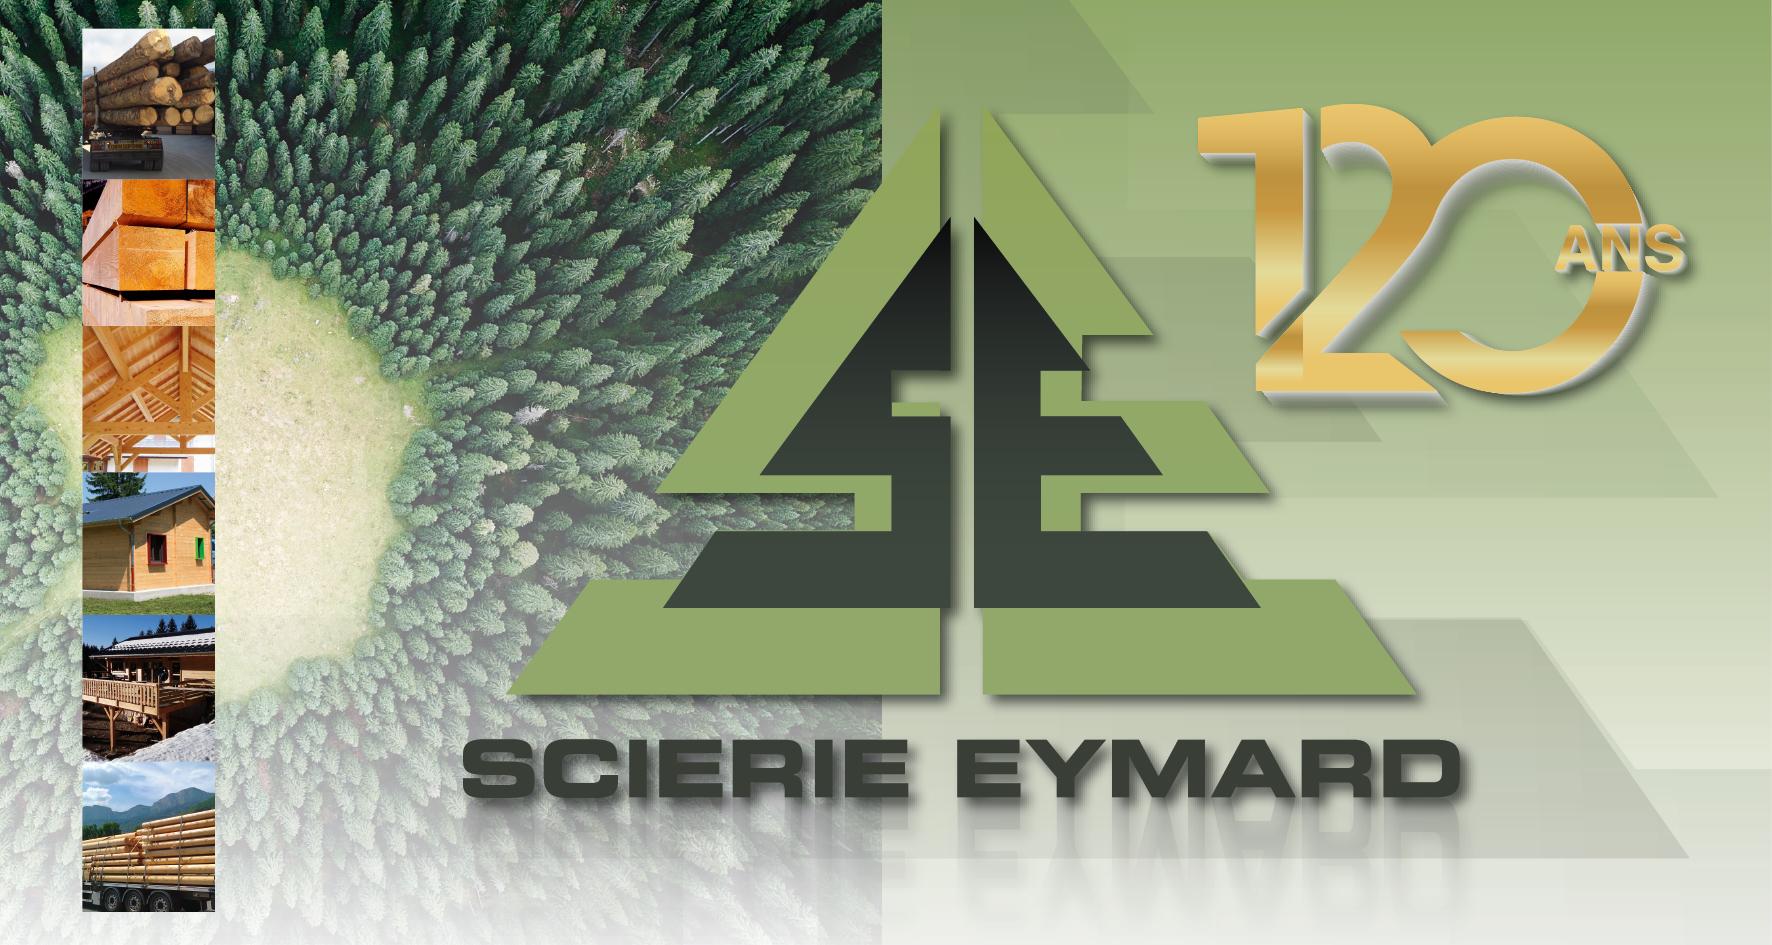 Logo Scierie Eymard 120 ans